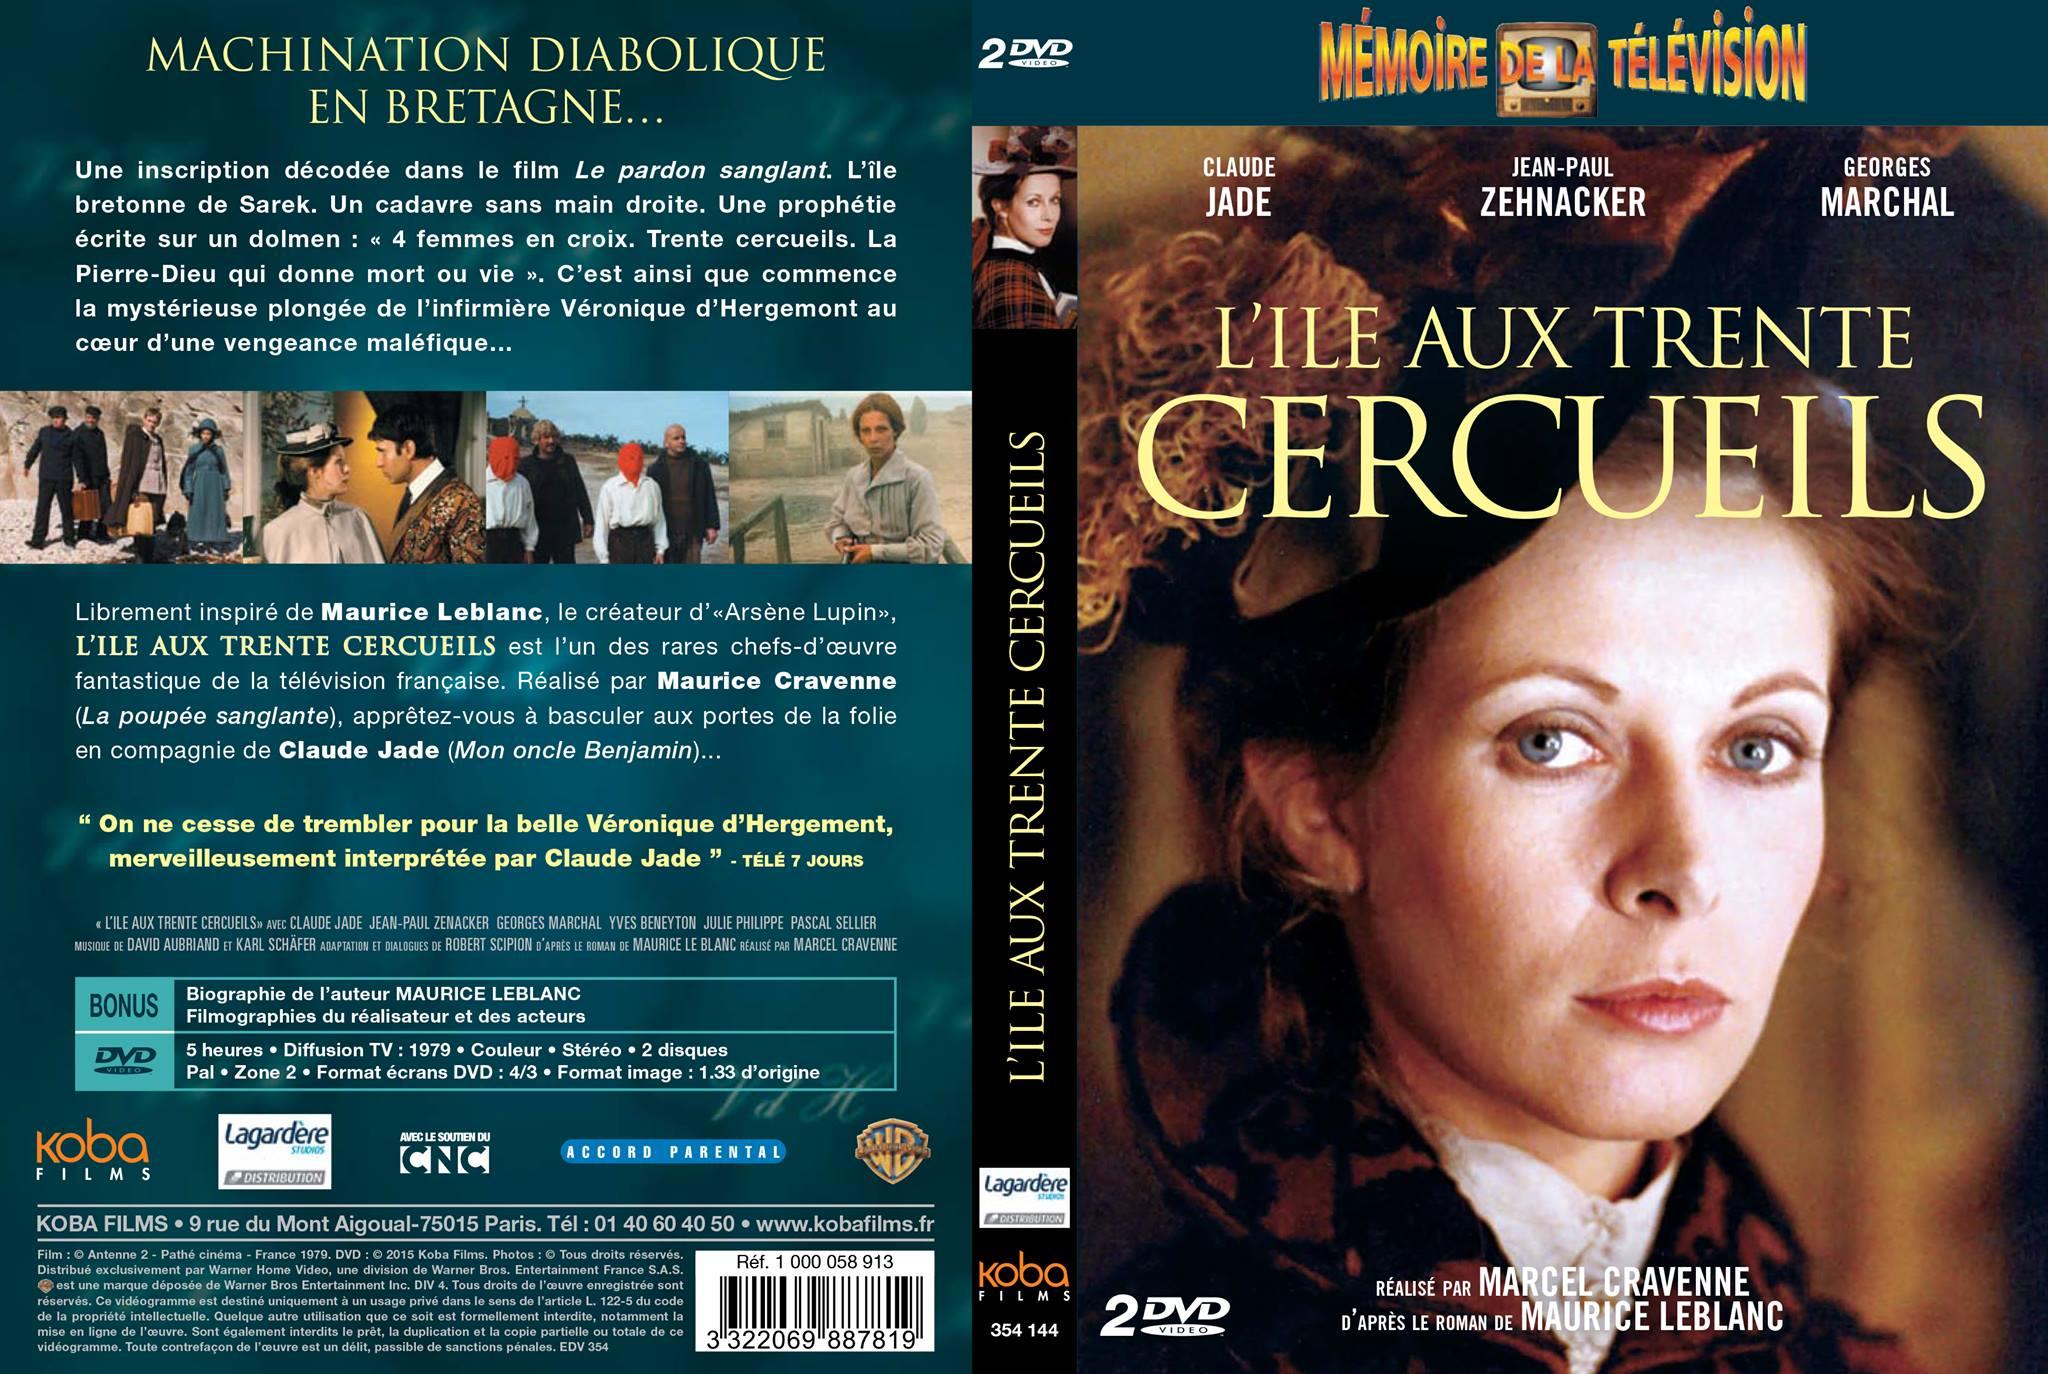 Claude Jade, Ile aux rente cercueils, Insel der 30 Tode, Insel der dreißig Särge DVD